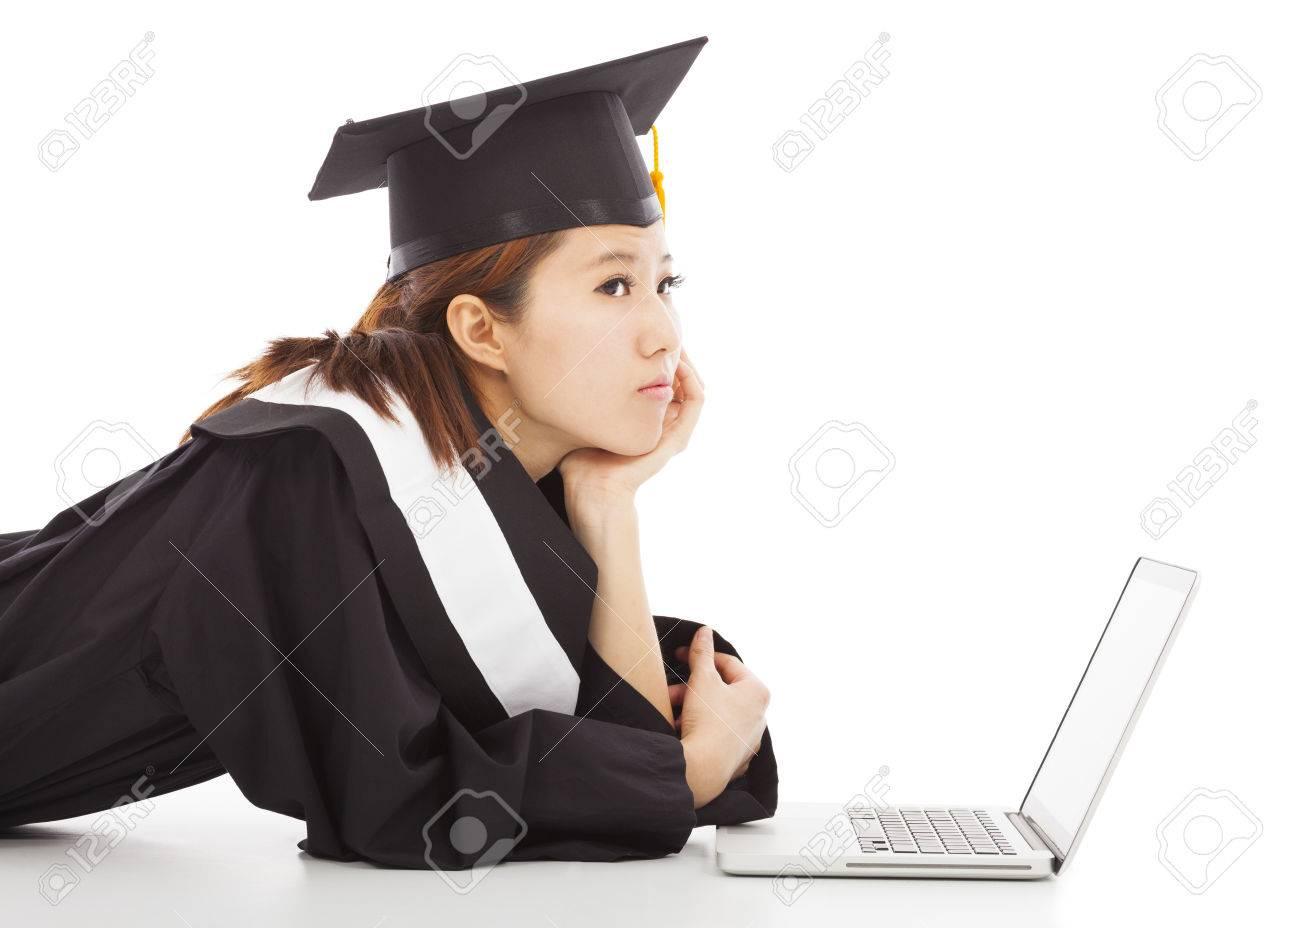 unhappy female graduation thinking career or job stock photo stock photo unhappy female graduation thinking career or job